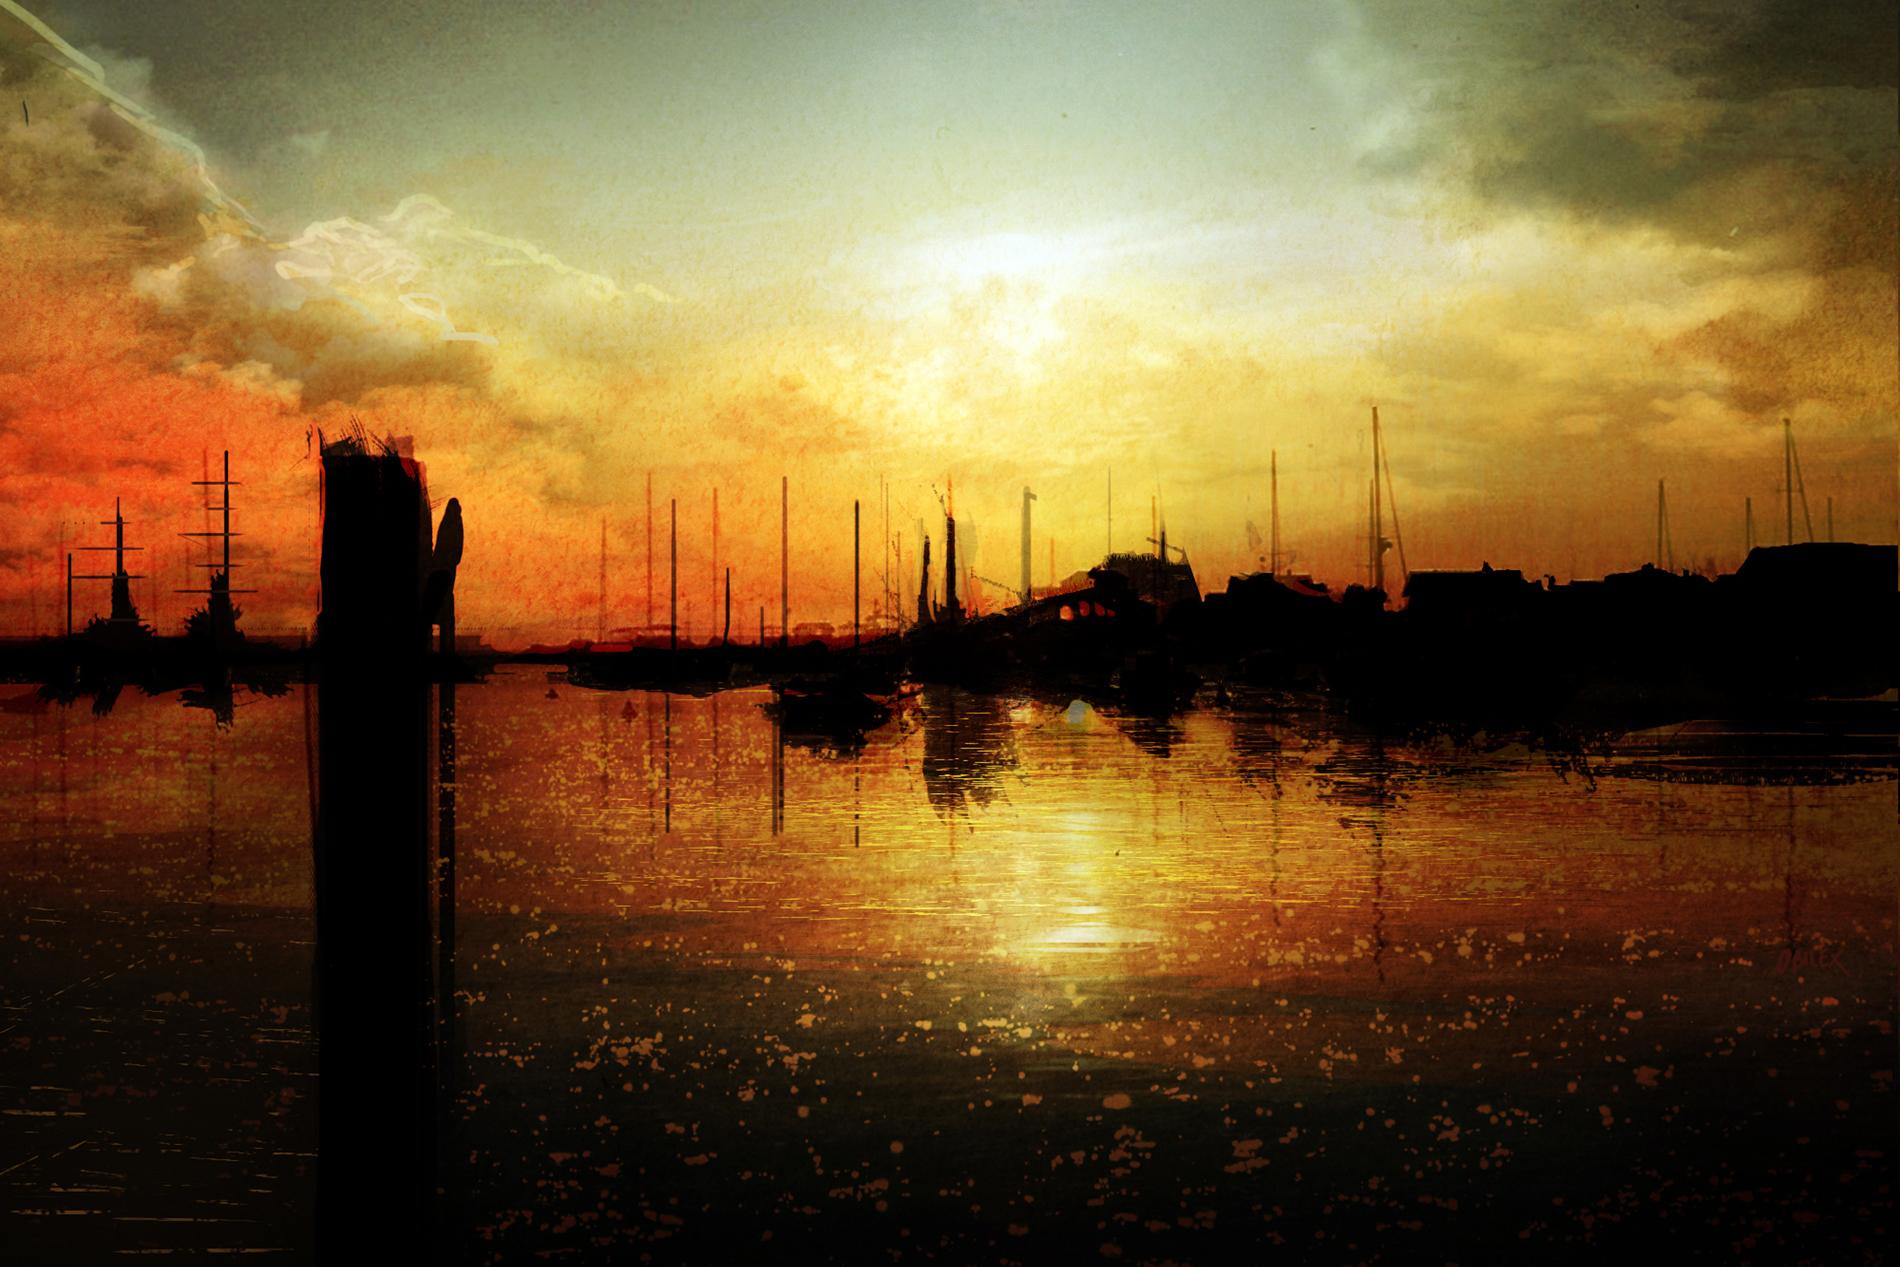 harbor_By_Obilex